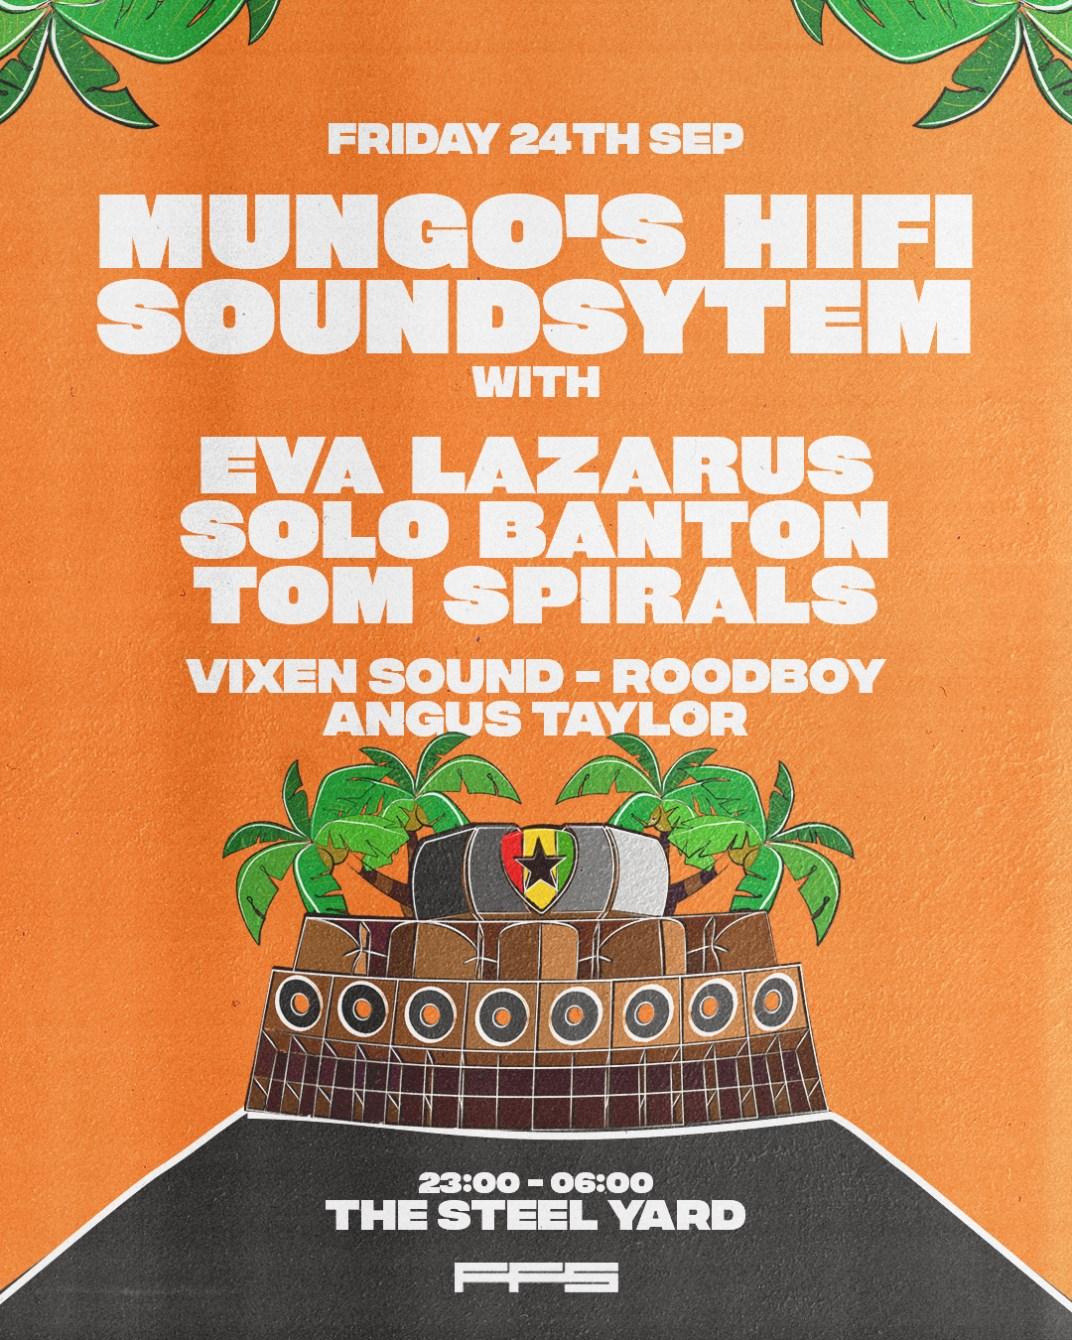 Mungo's Hifi Soundsystem - Flyer back